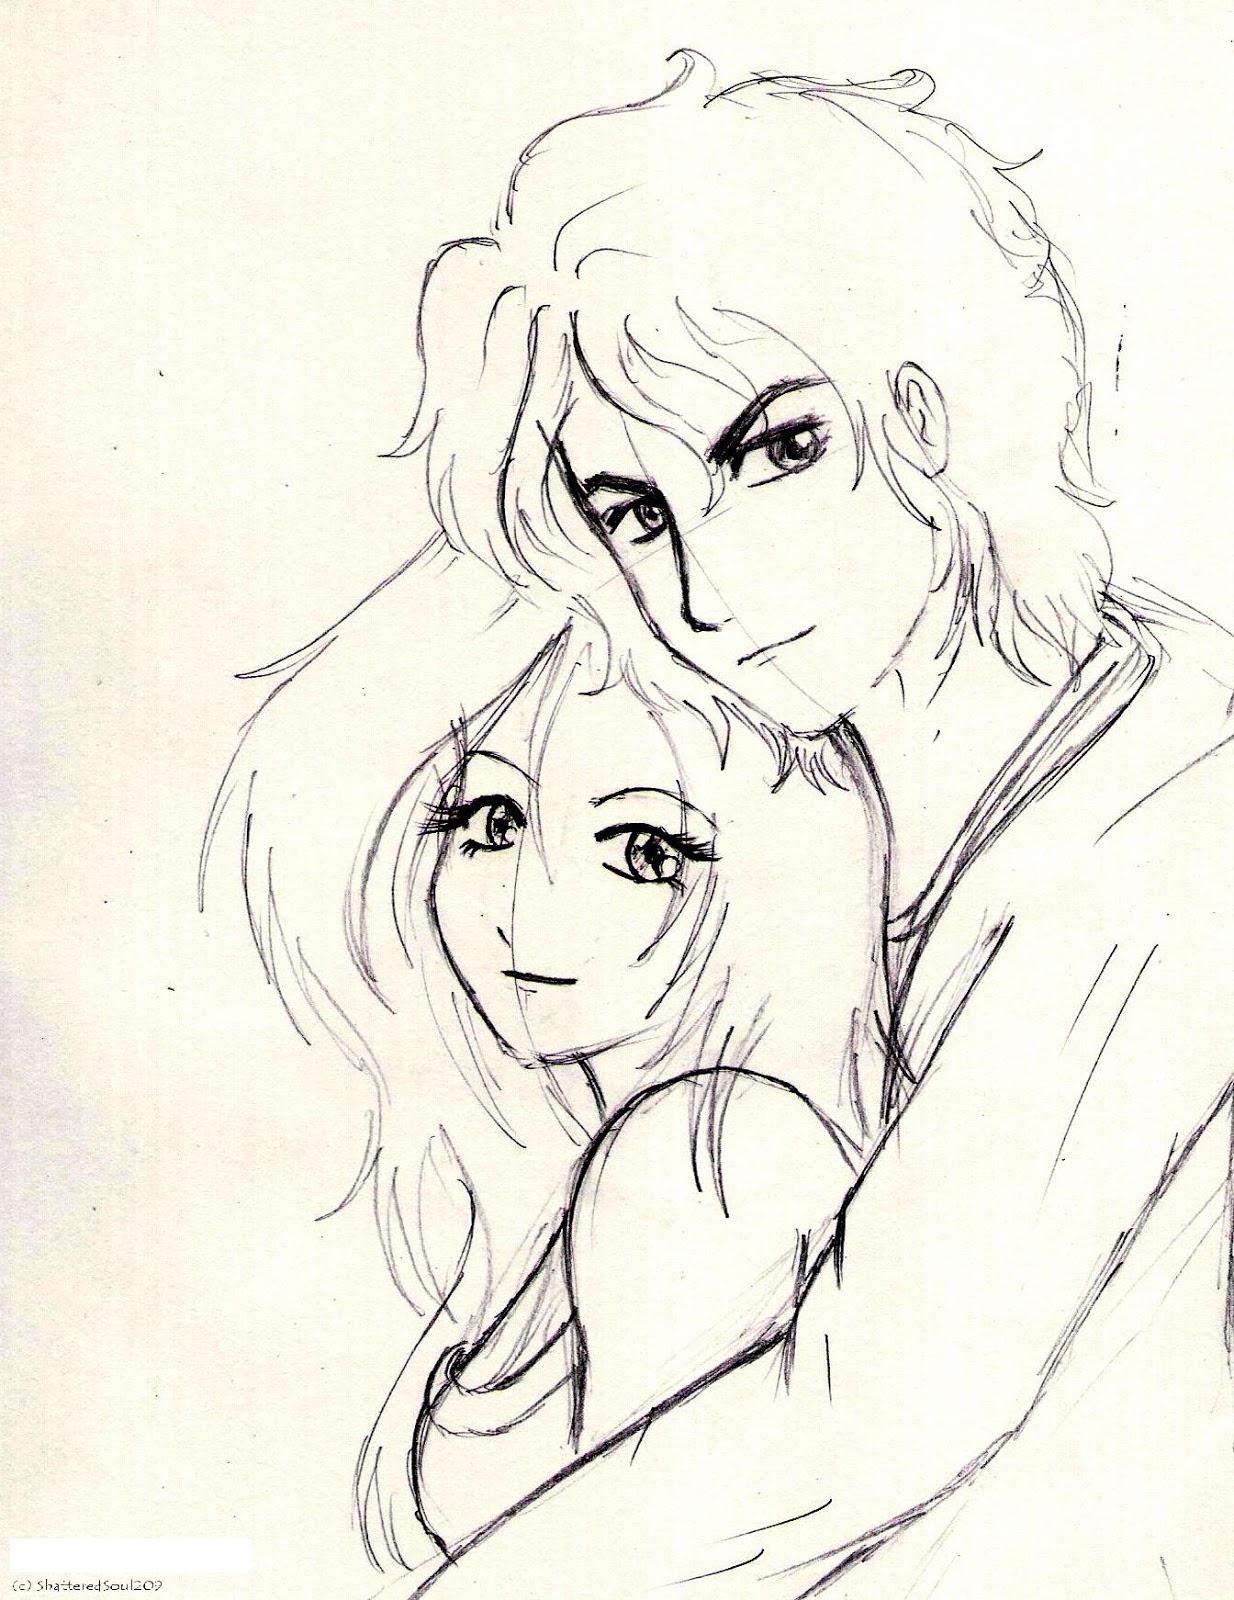 1234x1600 Sad Drawing Sketch Simple Pencil Sketches Of Couples Sad